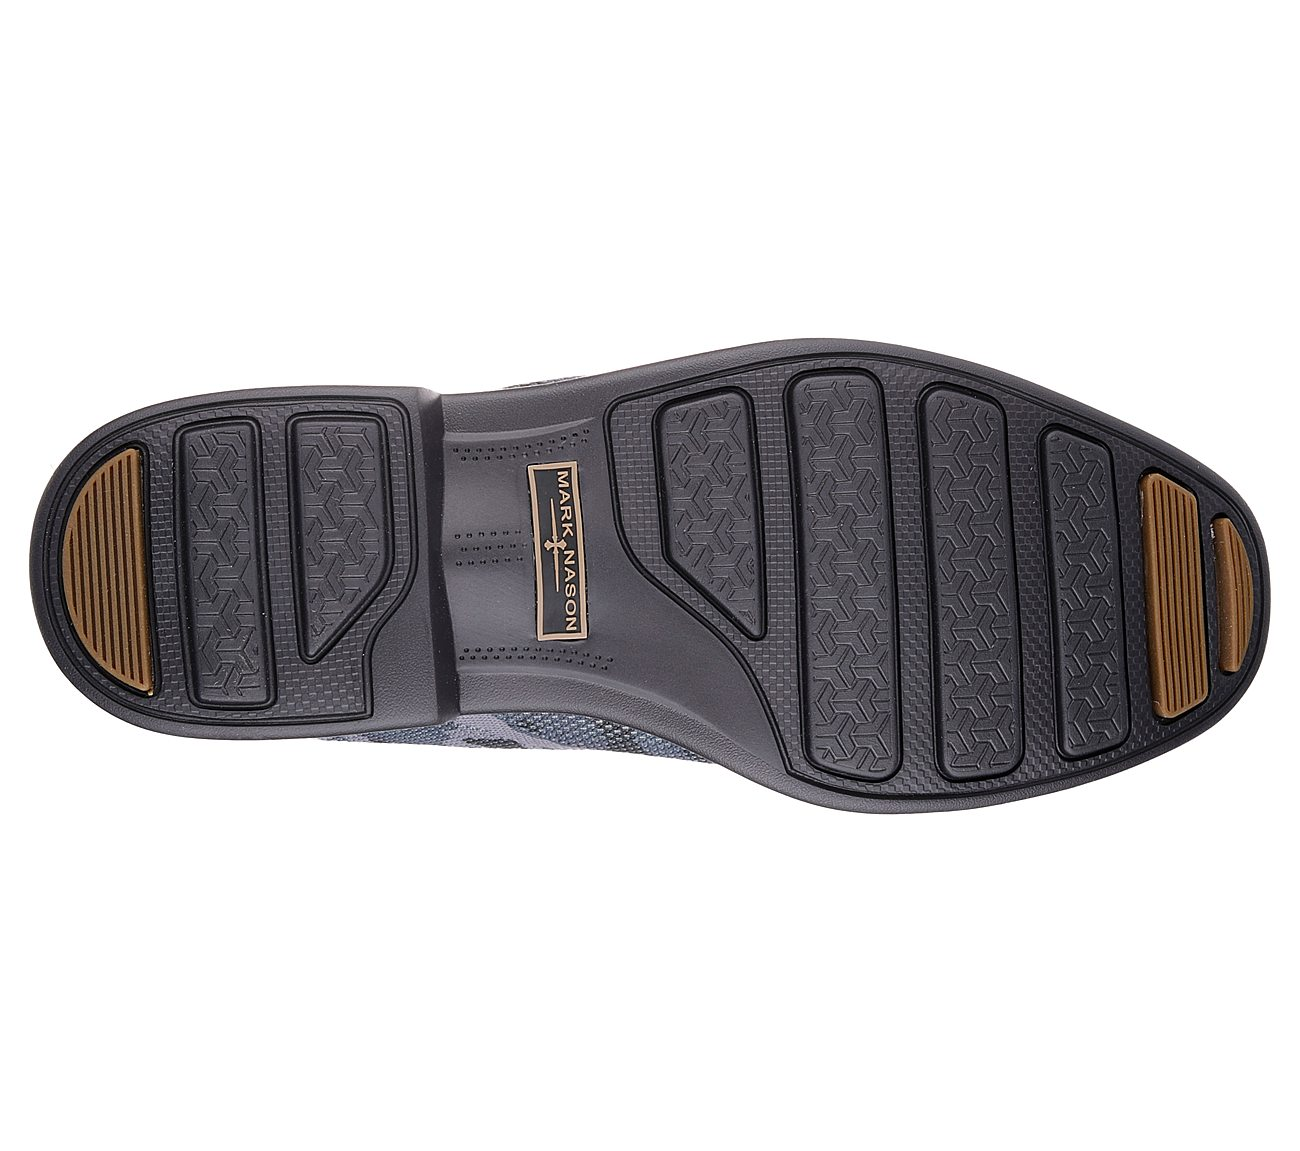 8aee5f9ecf6cc Buy SKECHERS Crane Mark Nason Shoes only $140.00